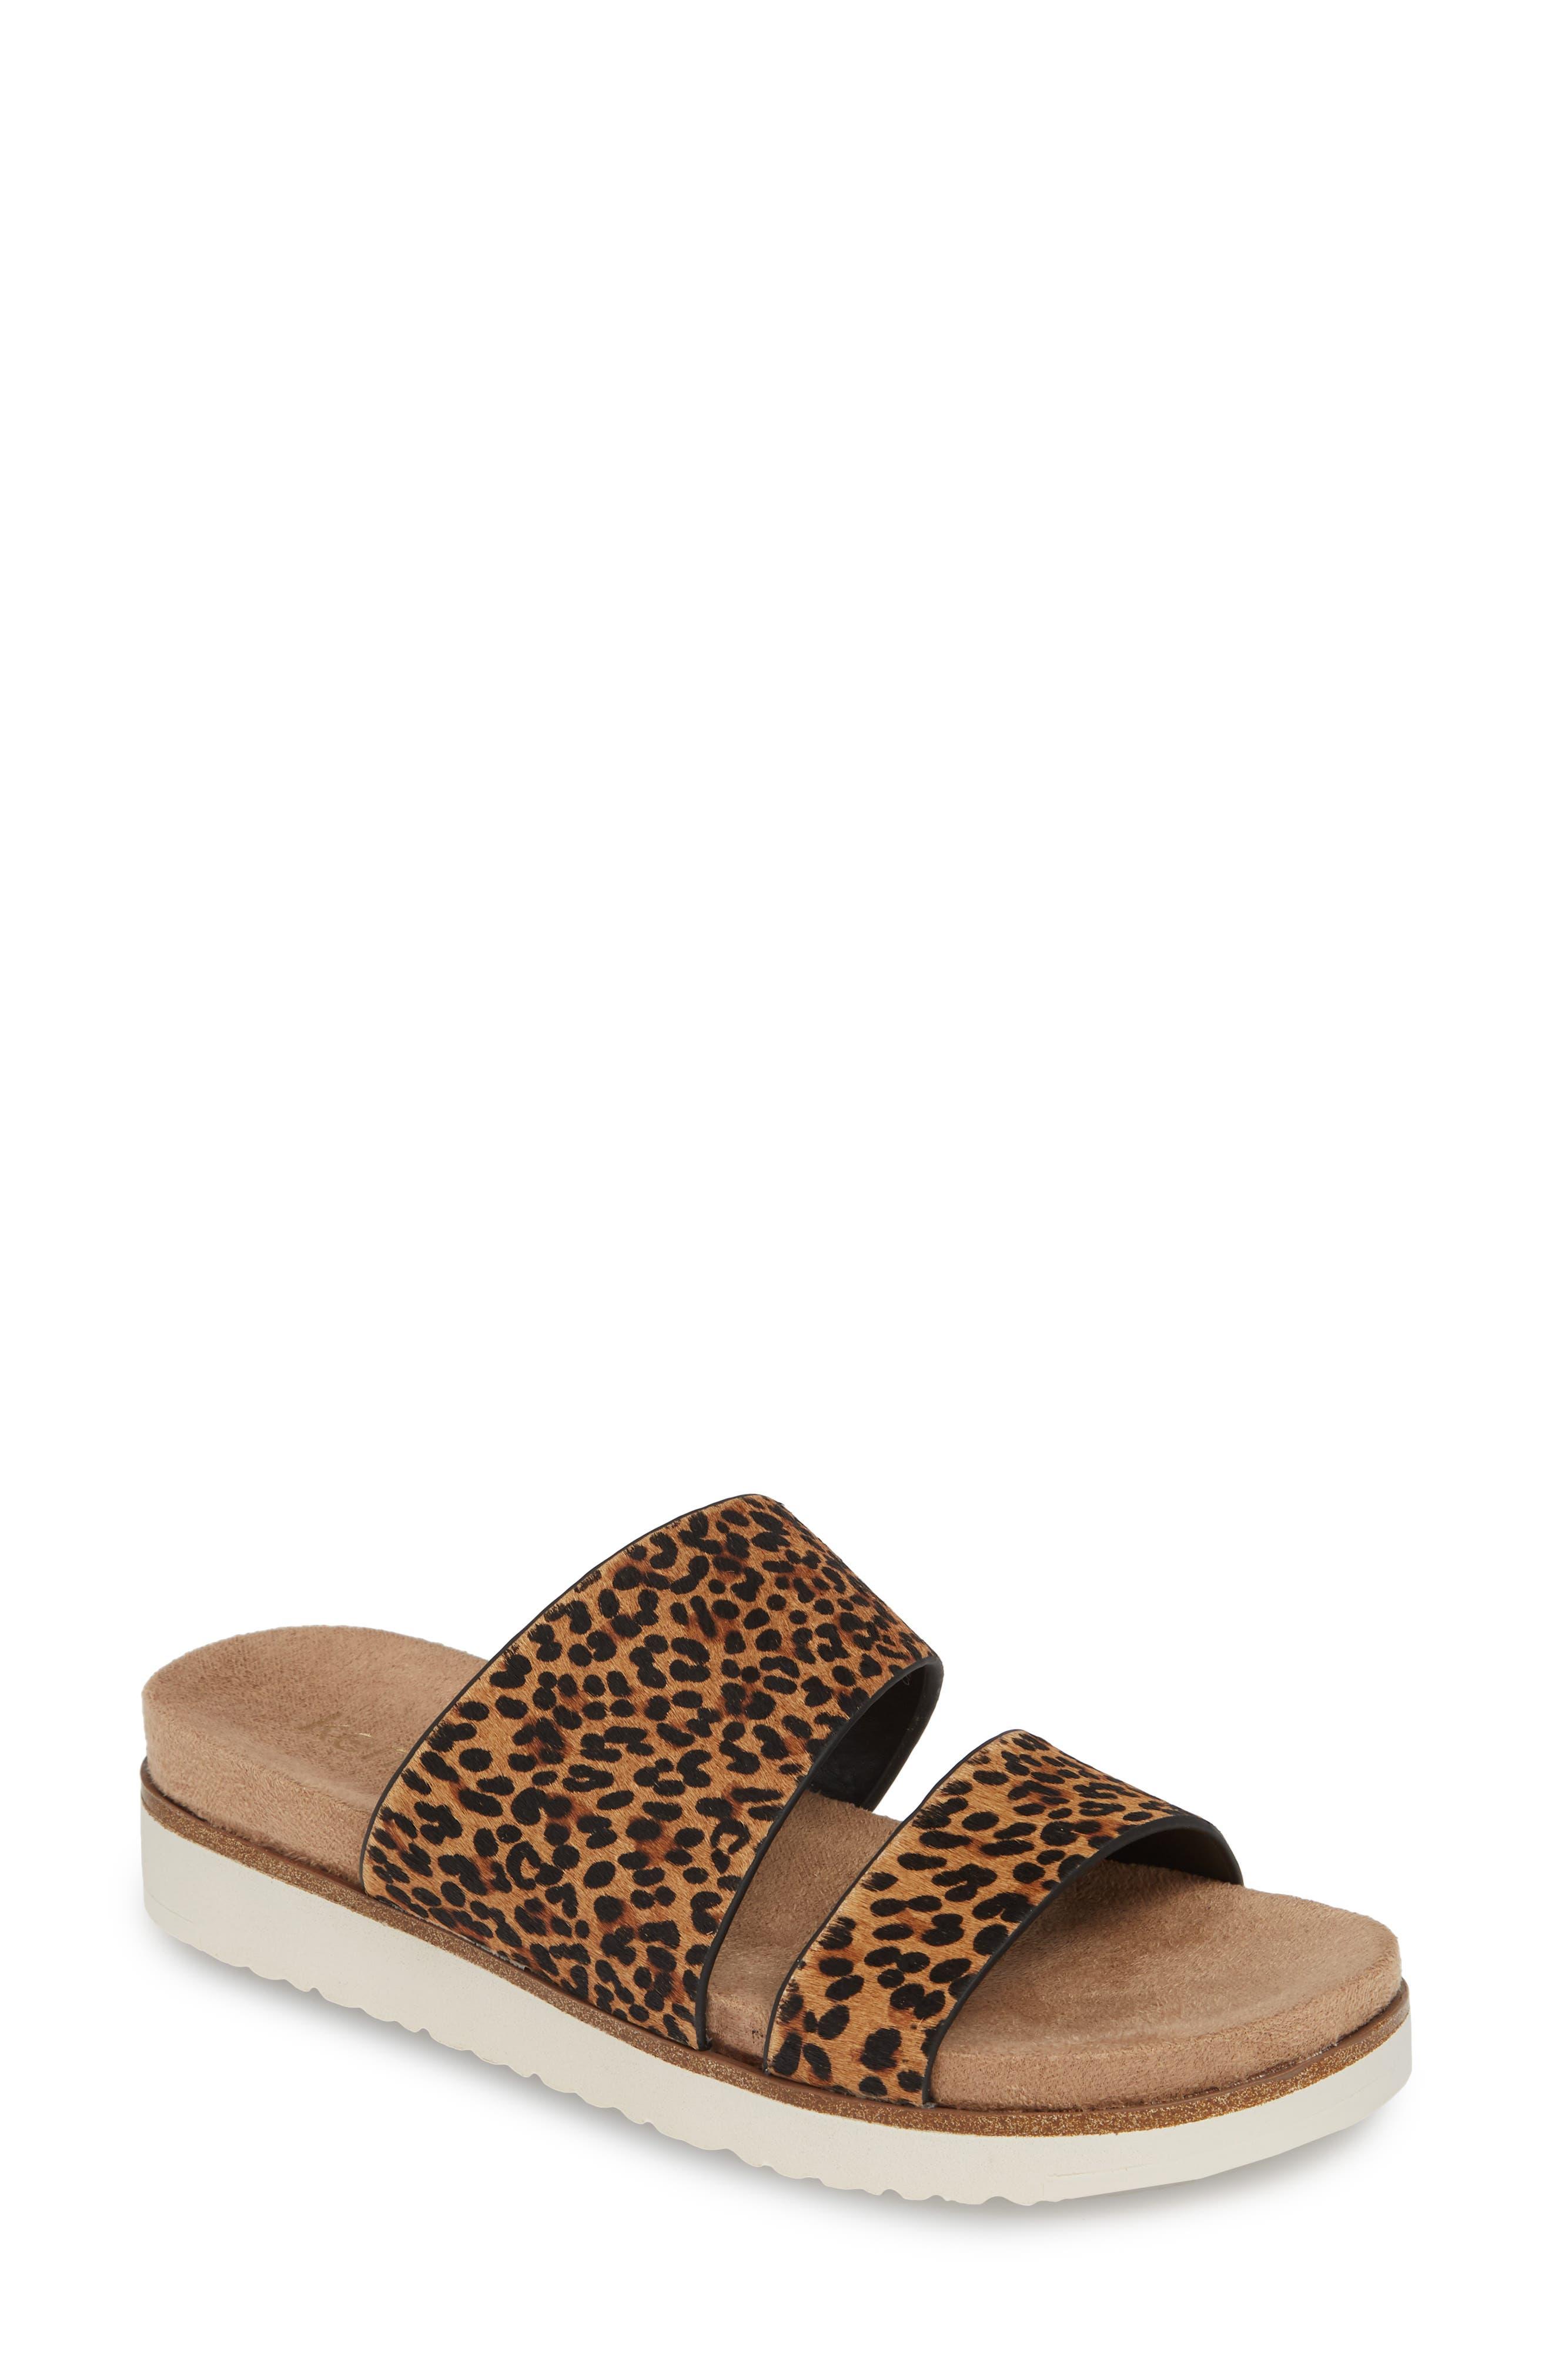 Danesha Genuine Calf Hair Slide Sandal, Main, color, LEOPARD PRINT CALF HAIR